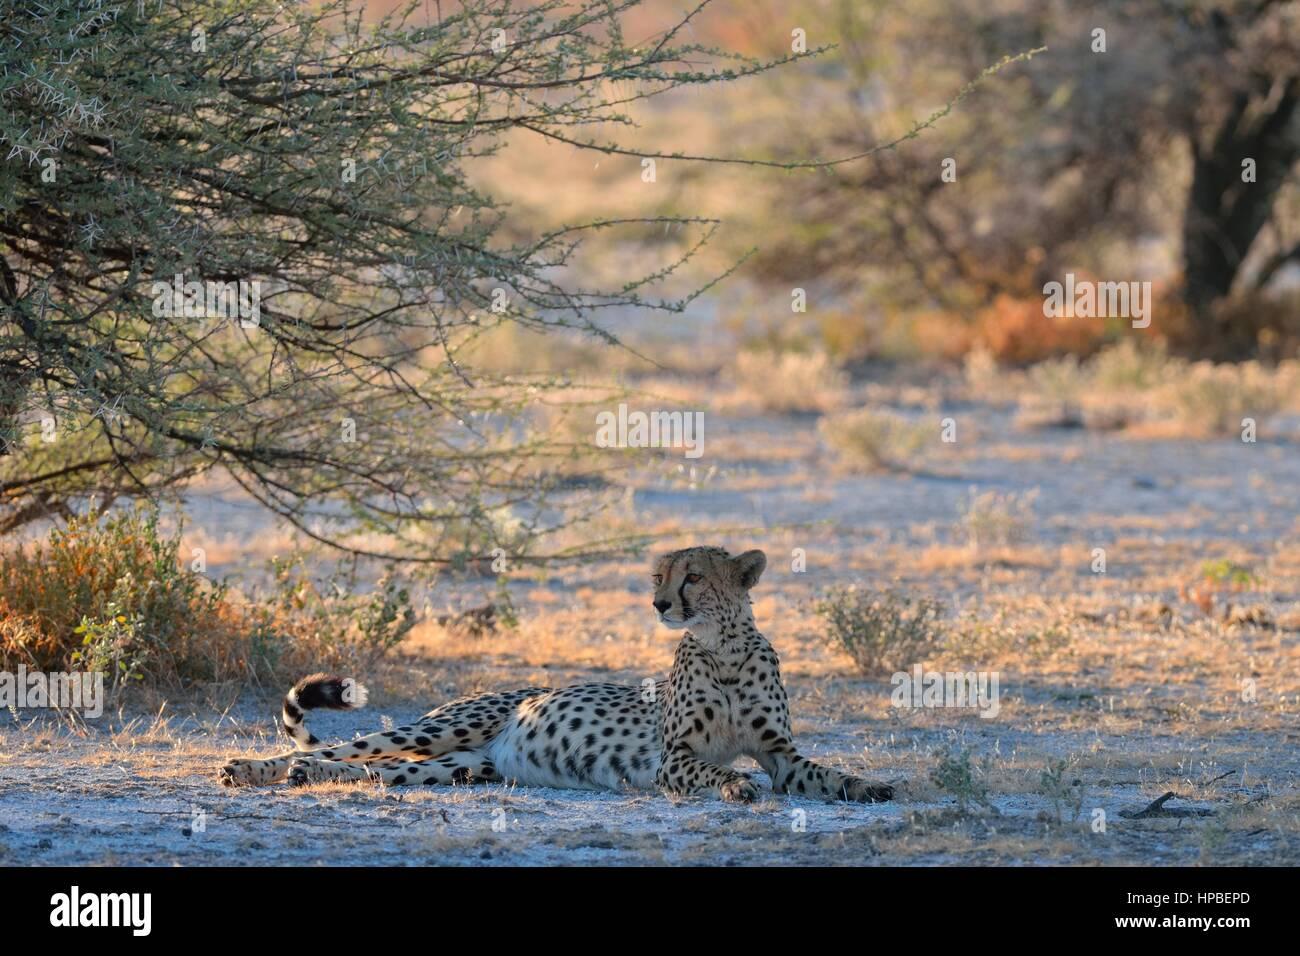 Cheetah (Acinonyx jubatus), female, lying in the shade of a tree, attentive, Etosha National Park, Namibia, Africa Stock Photo